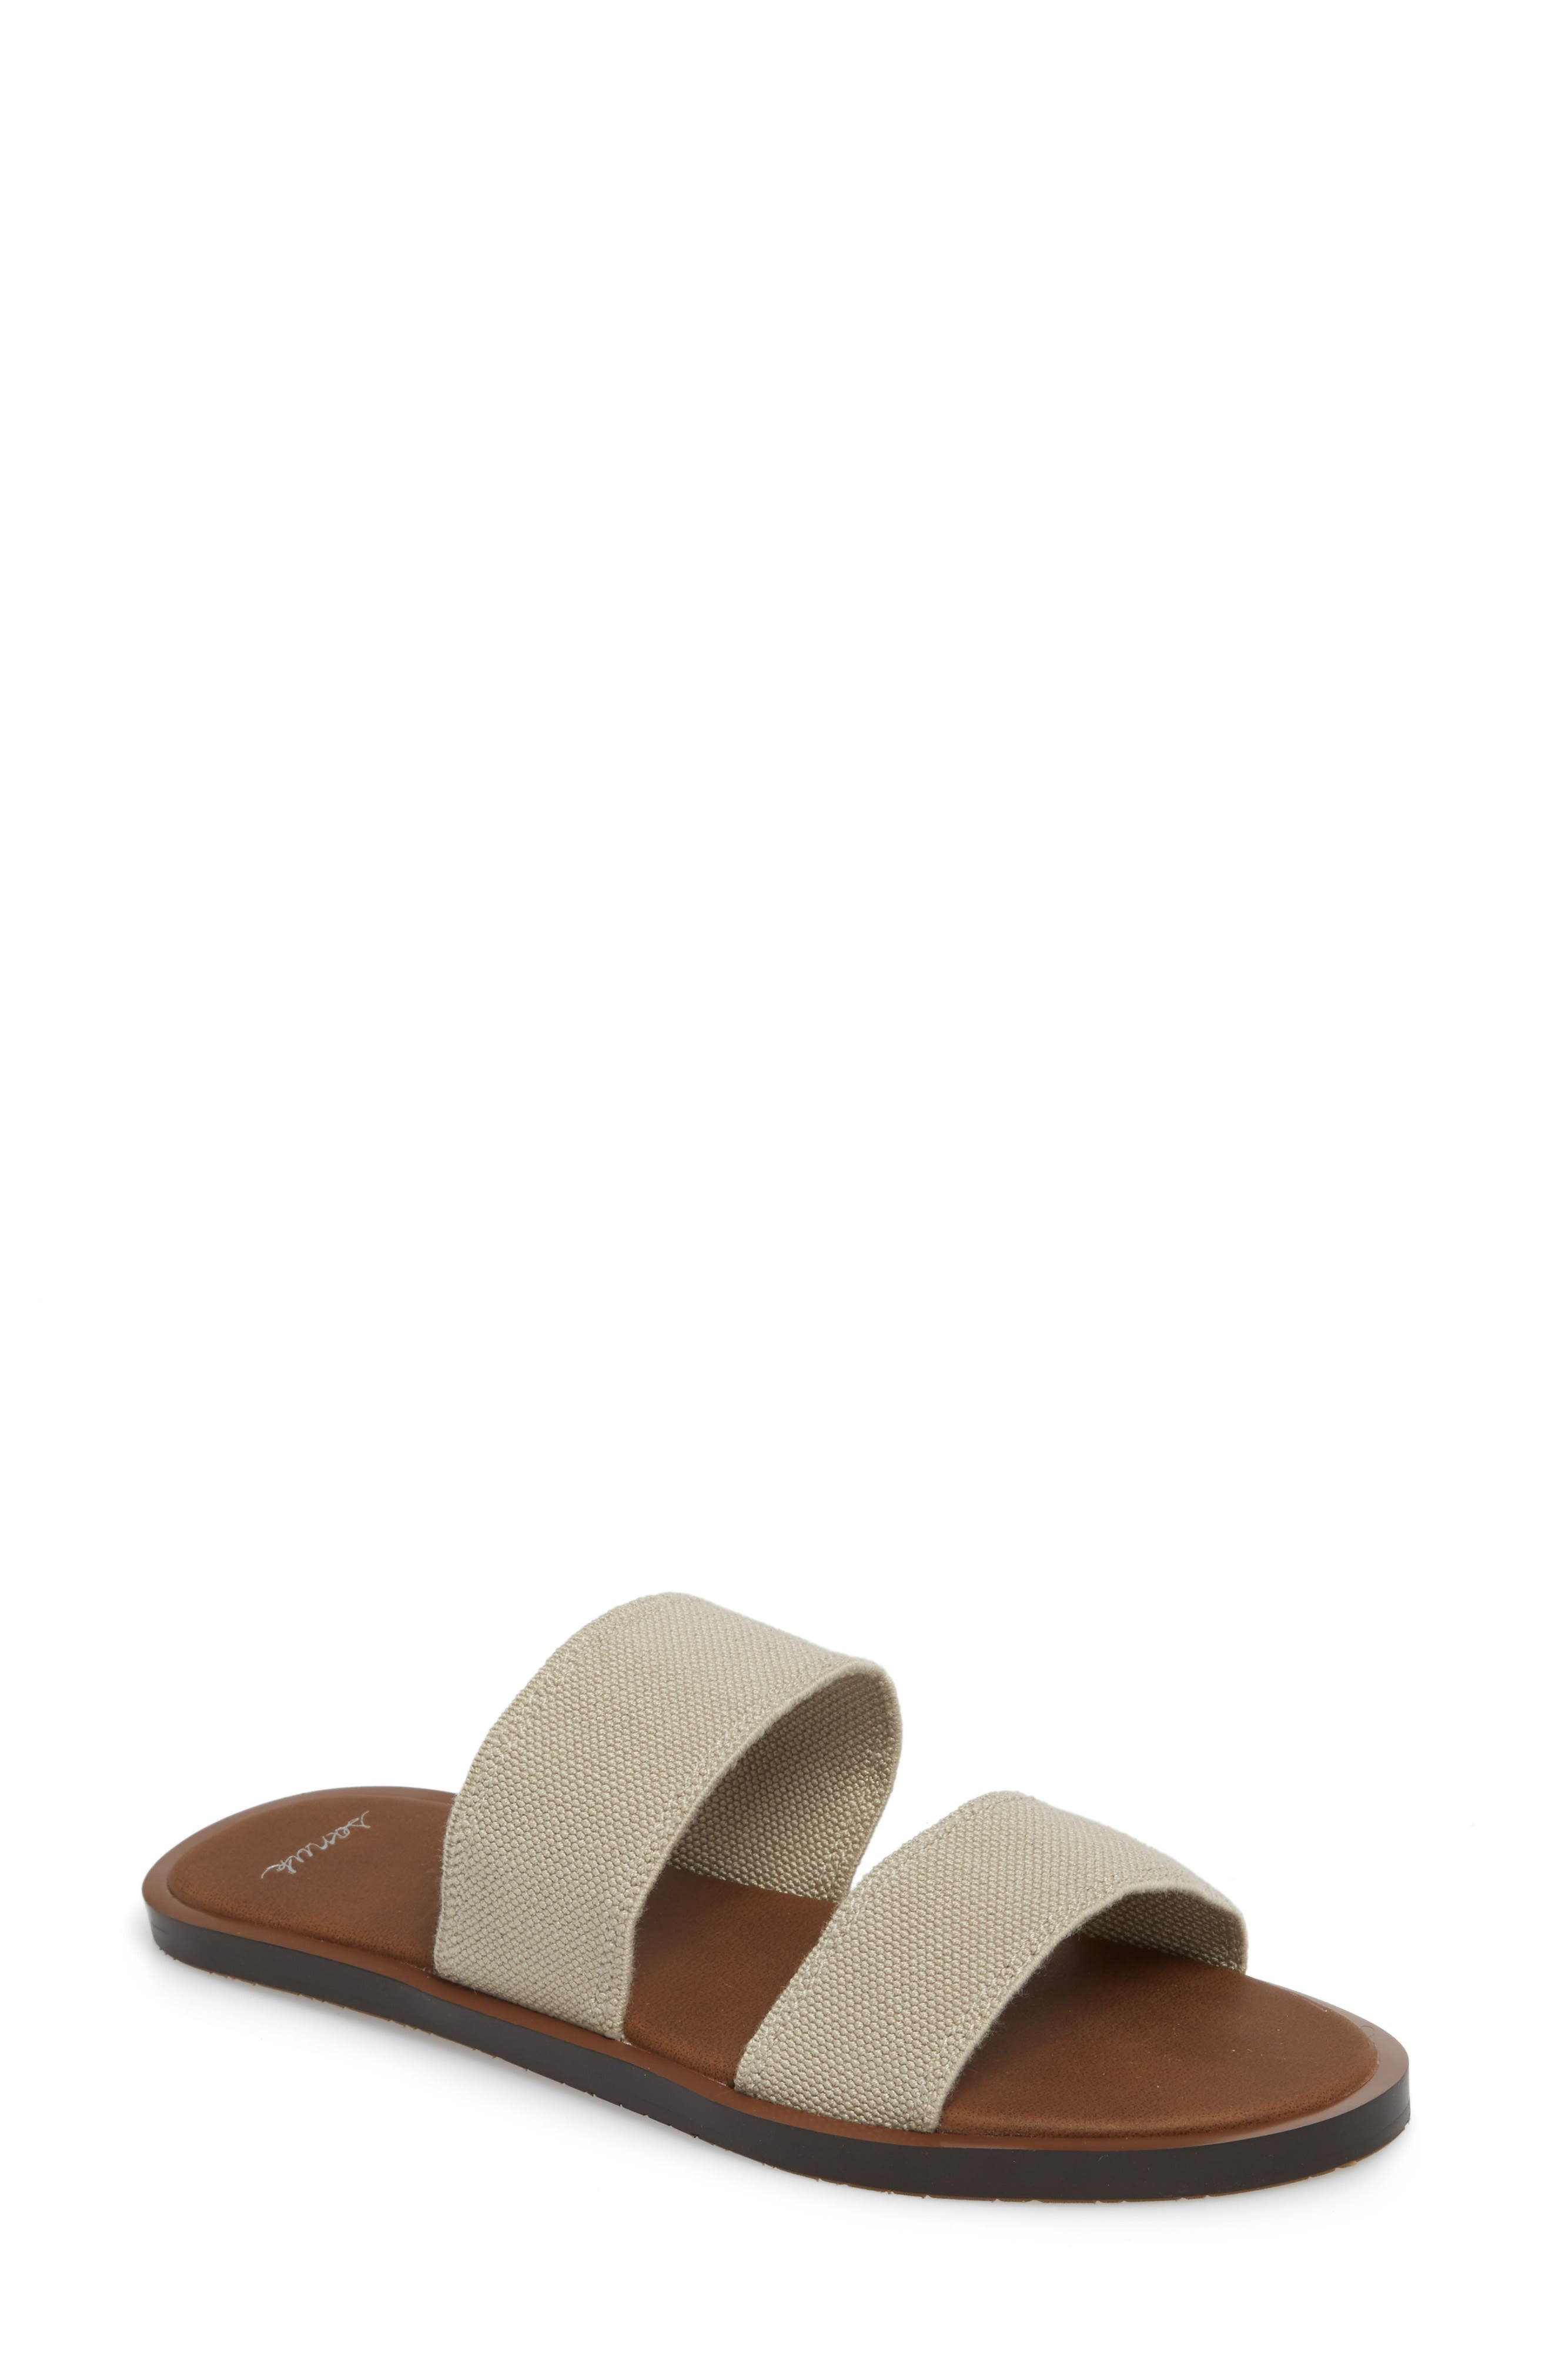 'Yoga Gora Gora' Slide Sandal,                         Main,                         color, Natural